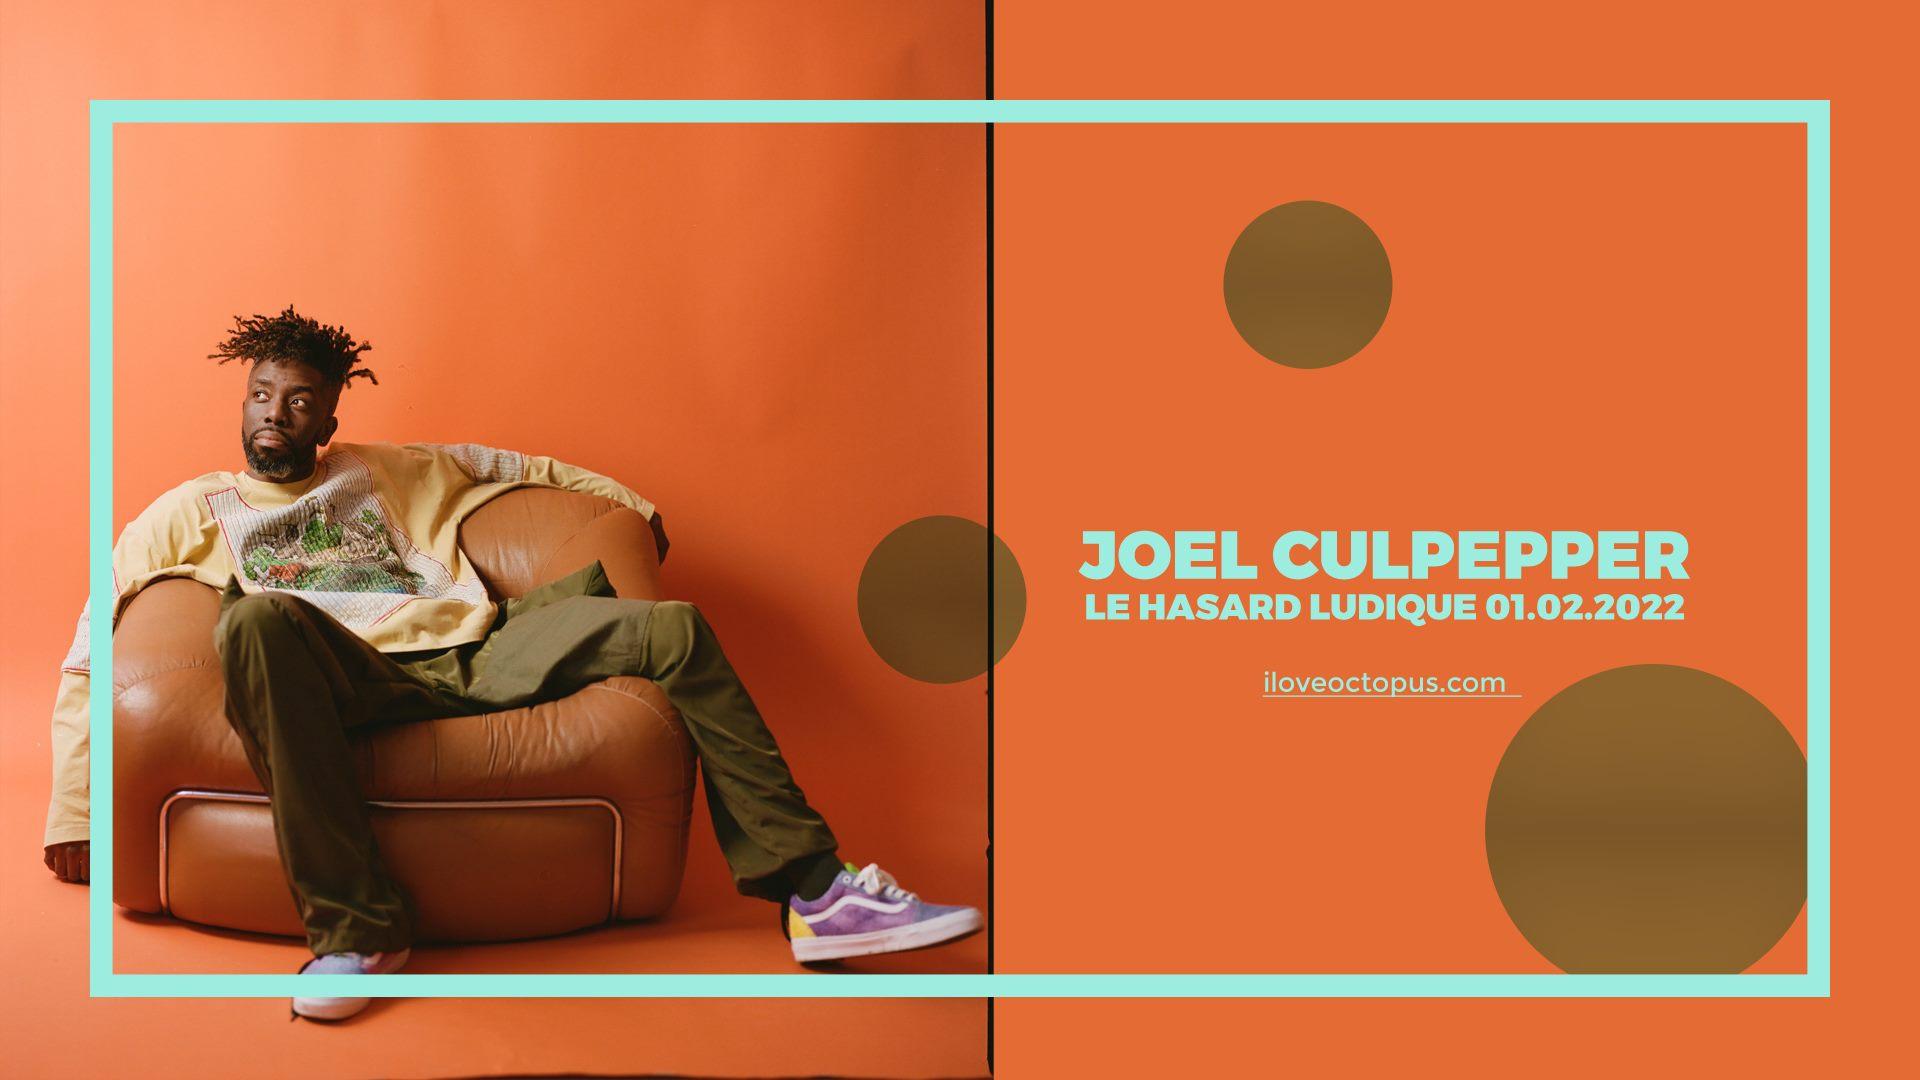 Joel Culpepper Le Hasard Ludique